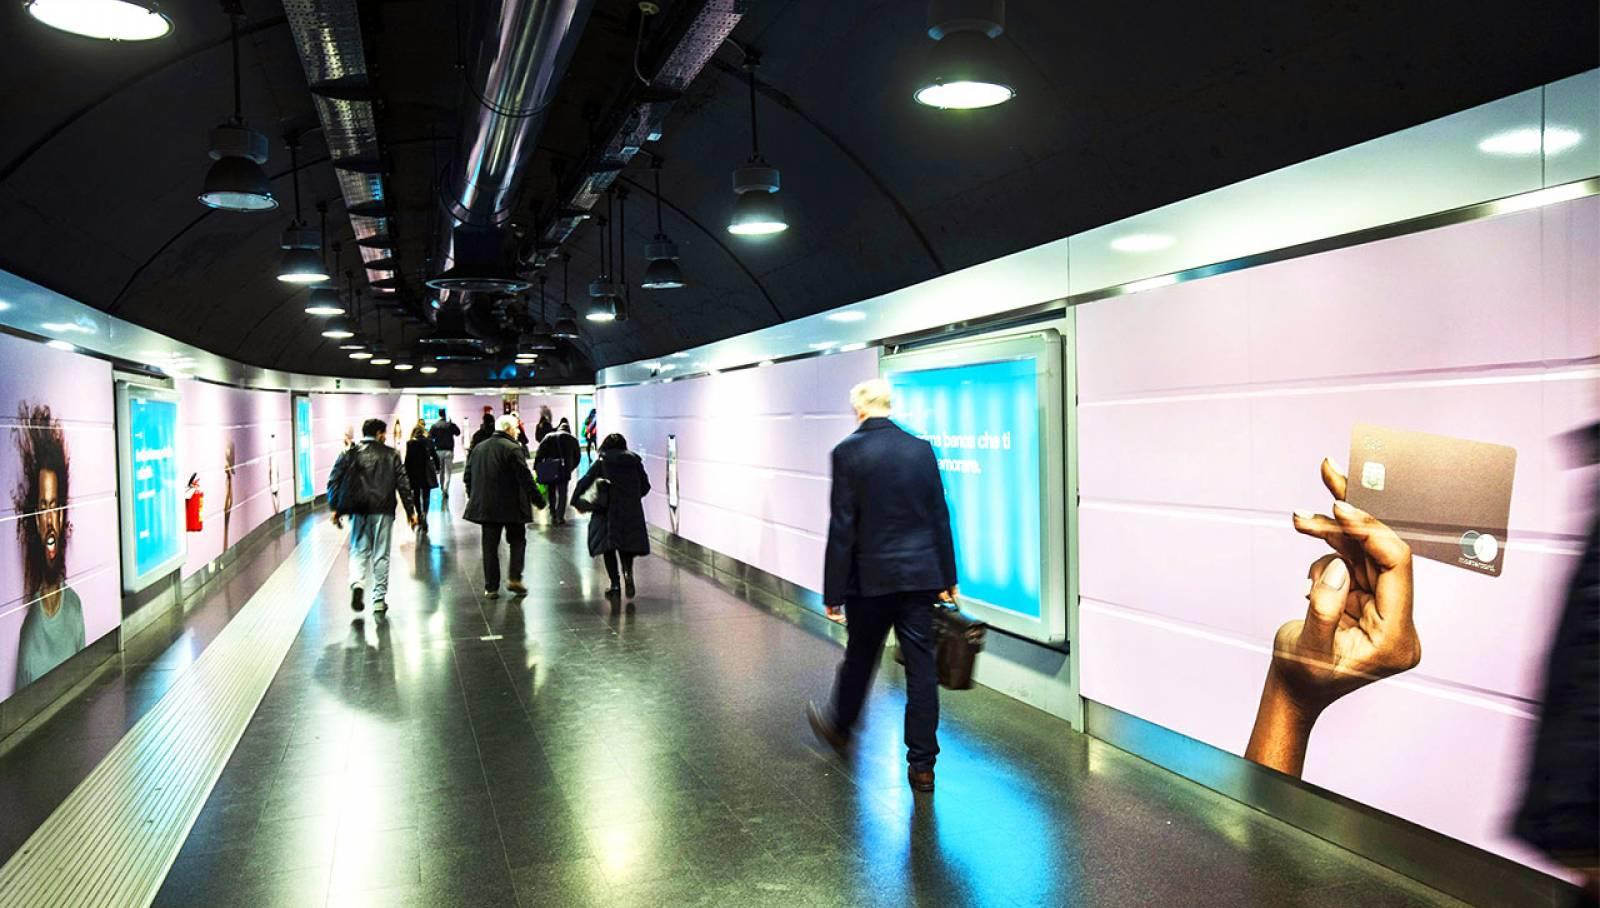 Pubblicità in metropolitana a Roma IGPDecaux Station Domination per N26